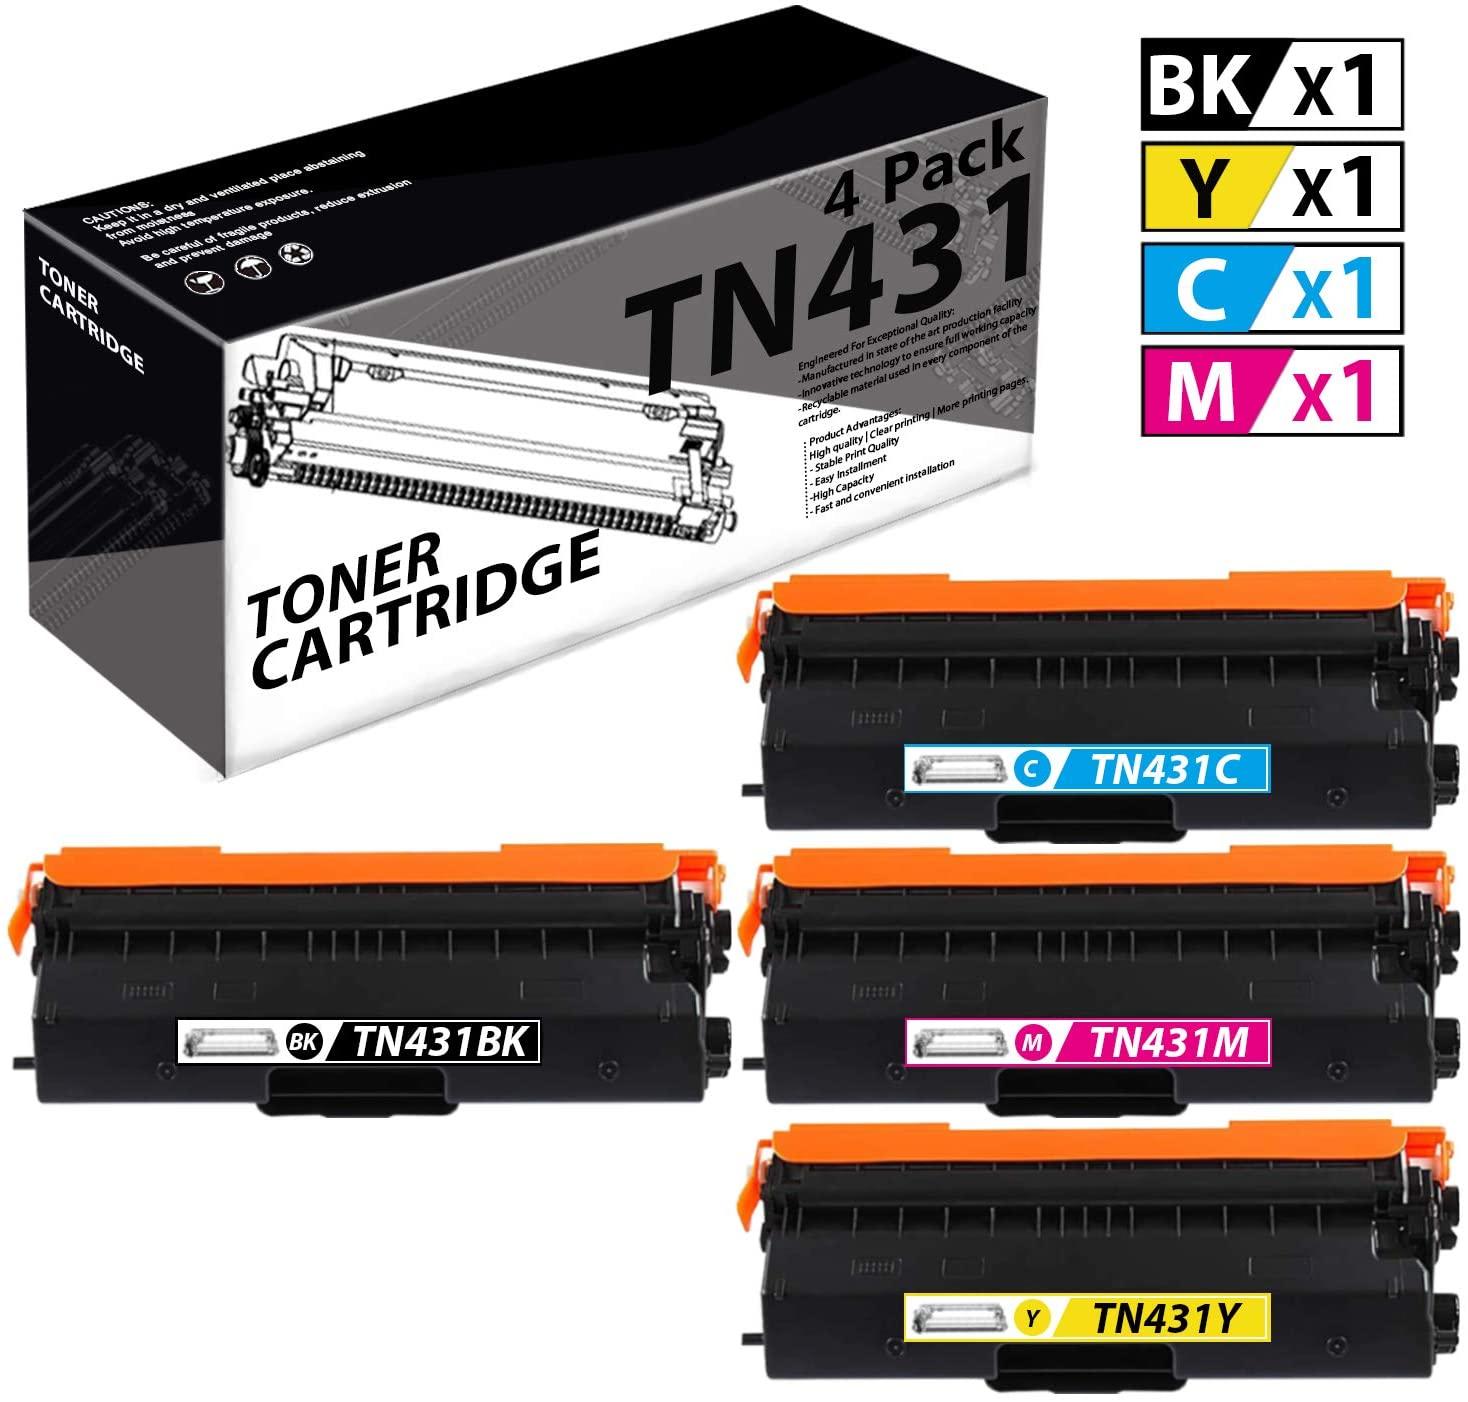 TN431(4 Pack-1K+1C+1M+1Y) Compatible Toner Cartridge Replacement for Brother HL-L8260CDW L8360CDW L8360CDWT DCP-L8410CDW MFC-L8610CDW L8690CDW L9570CDWT Printer.